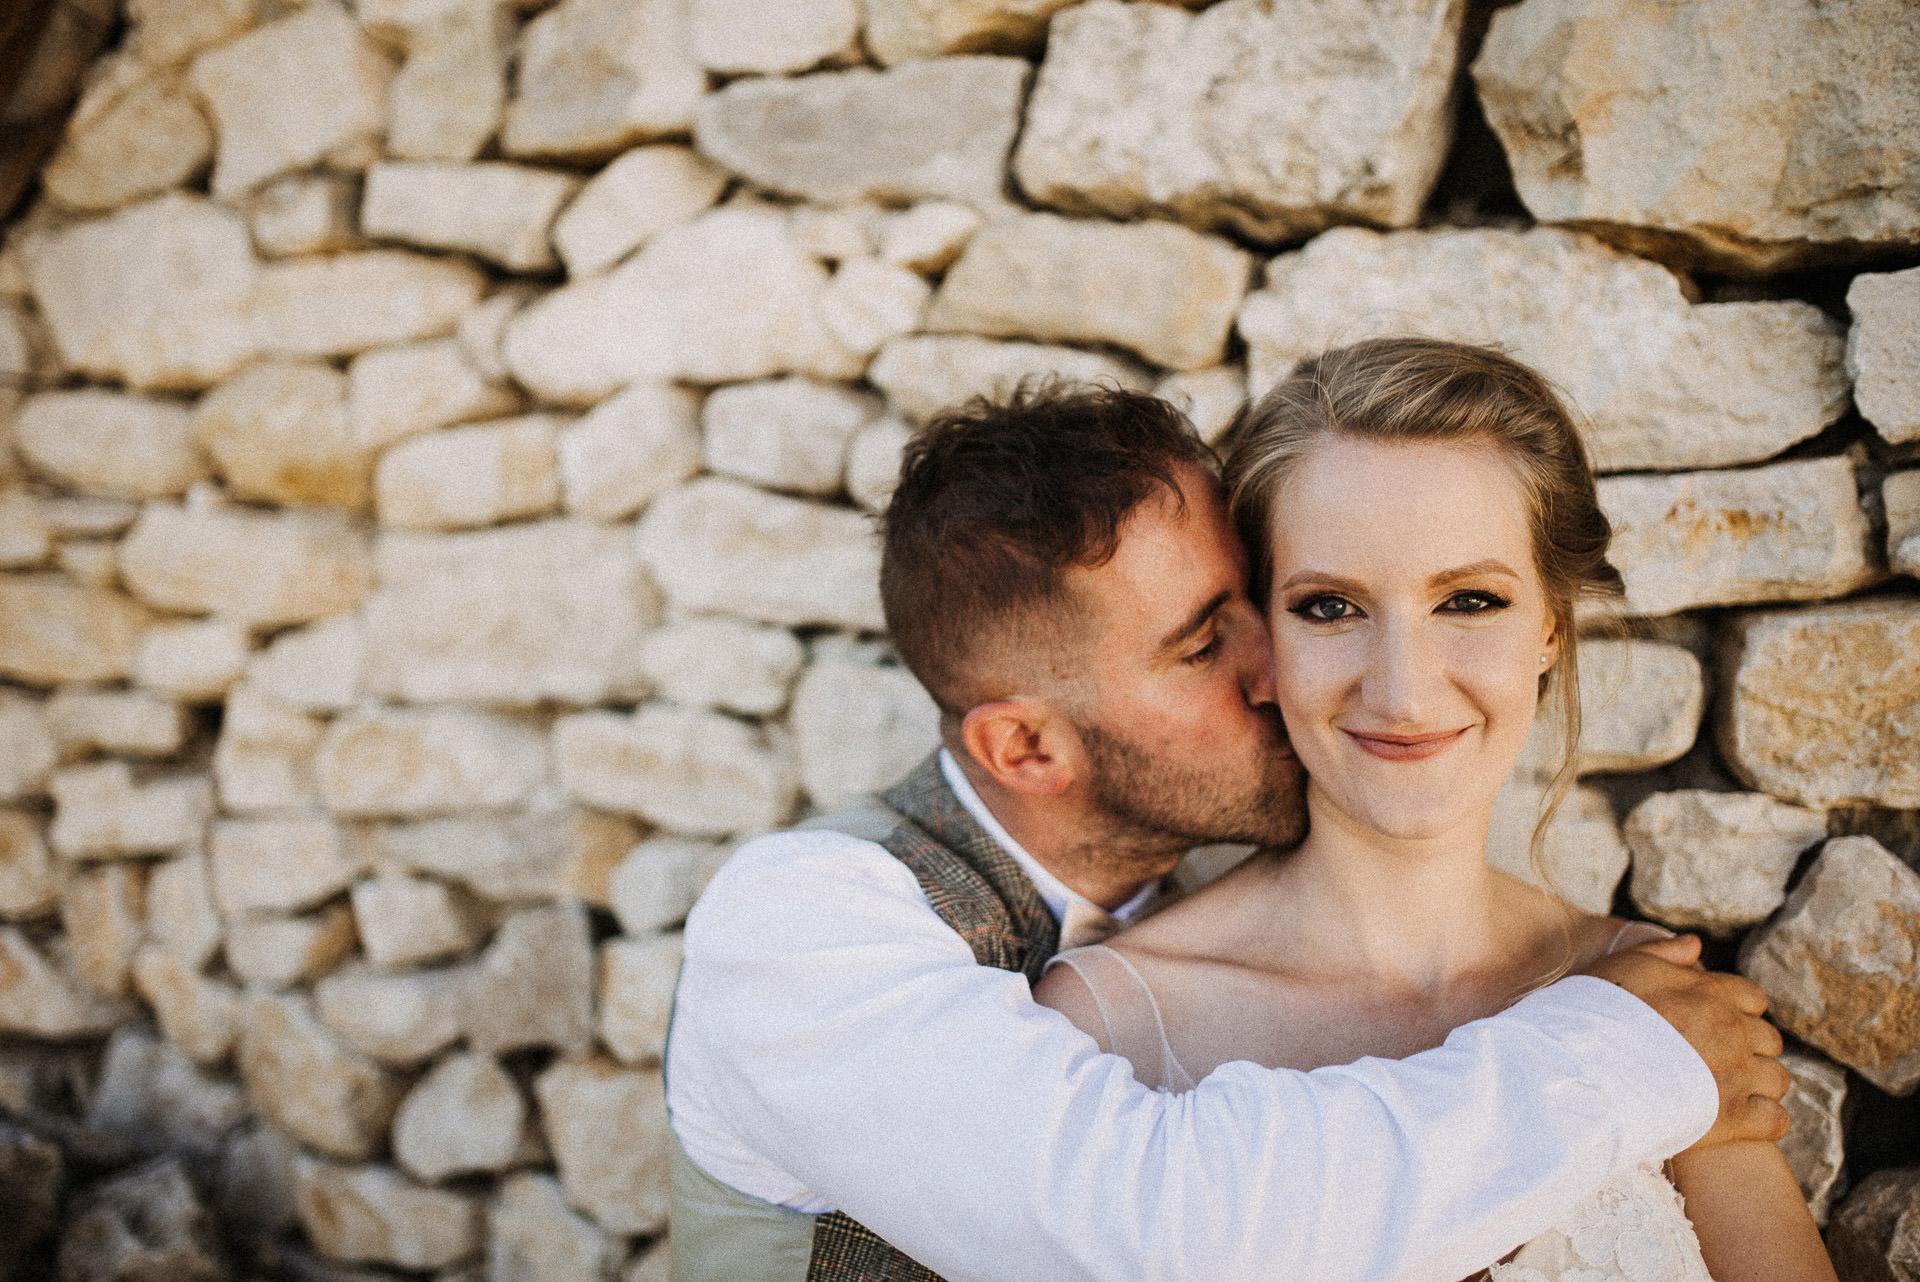 kreativ foto volegeny menyasszony csok nyak kiss neck